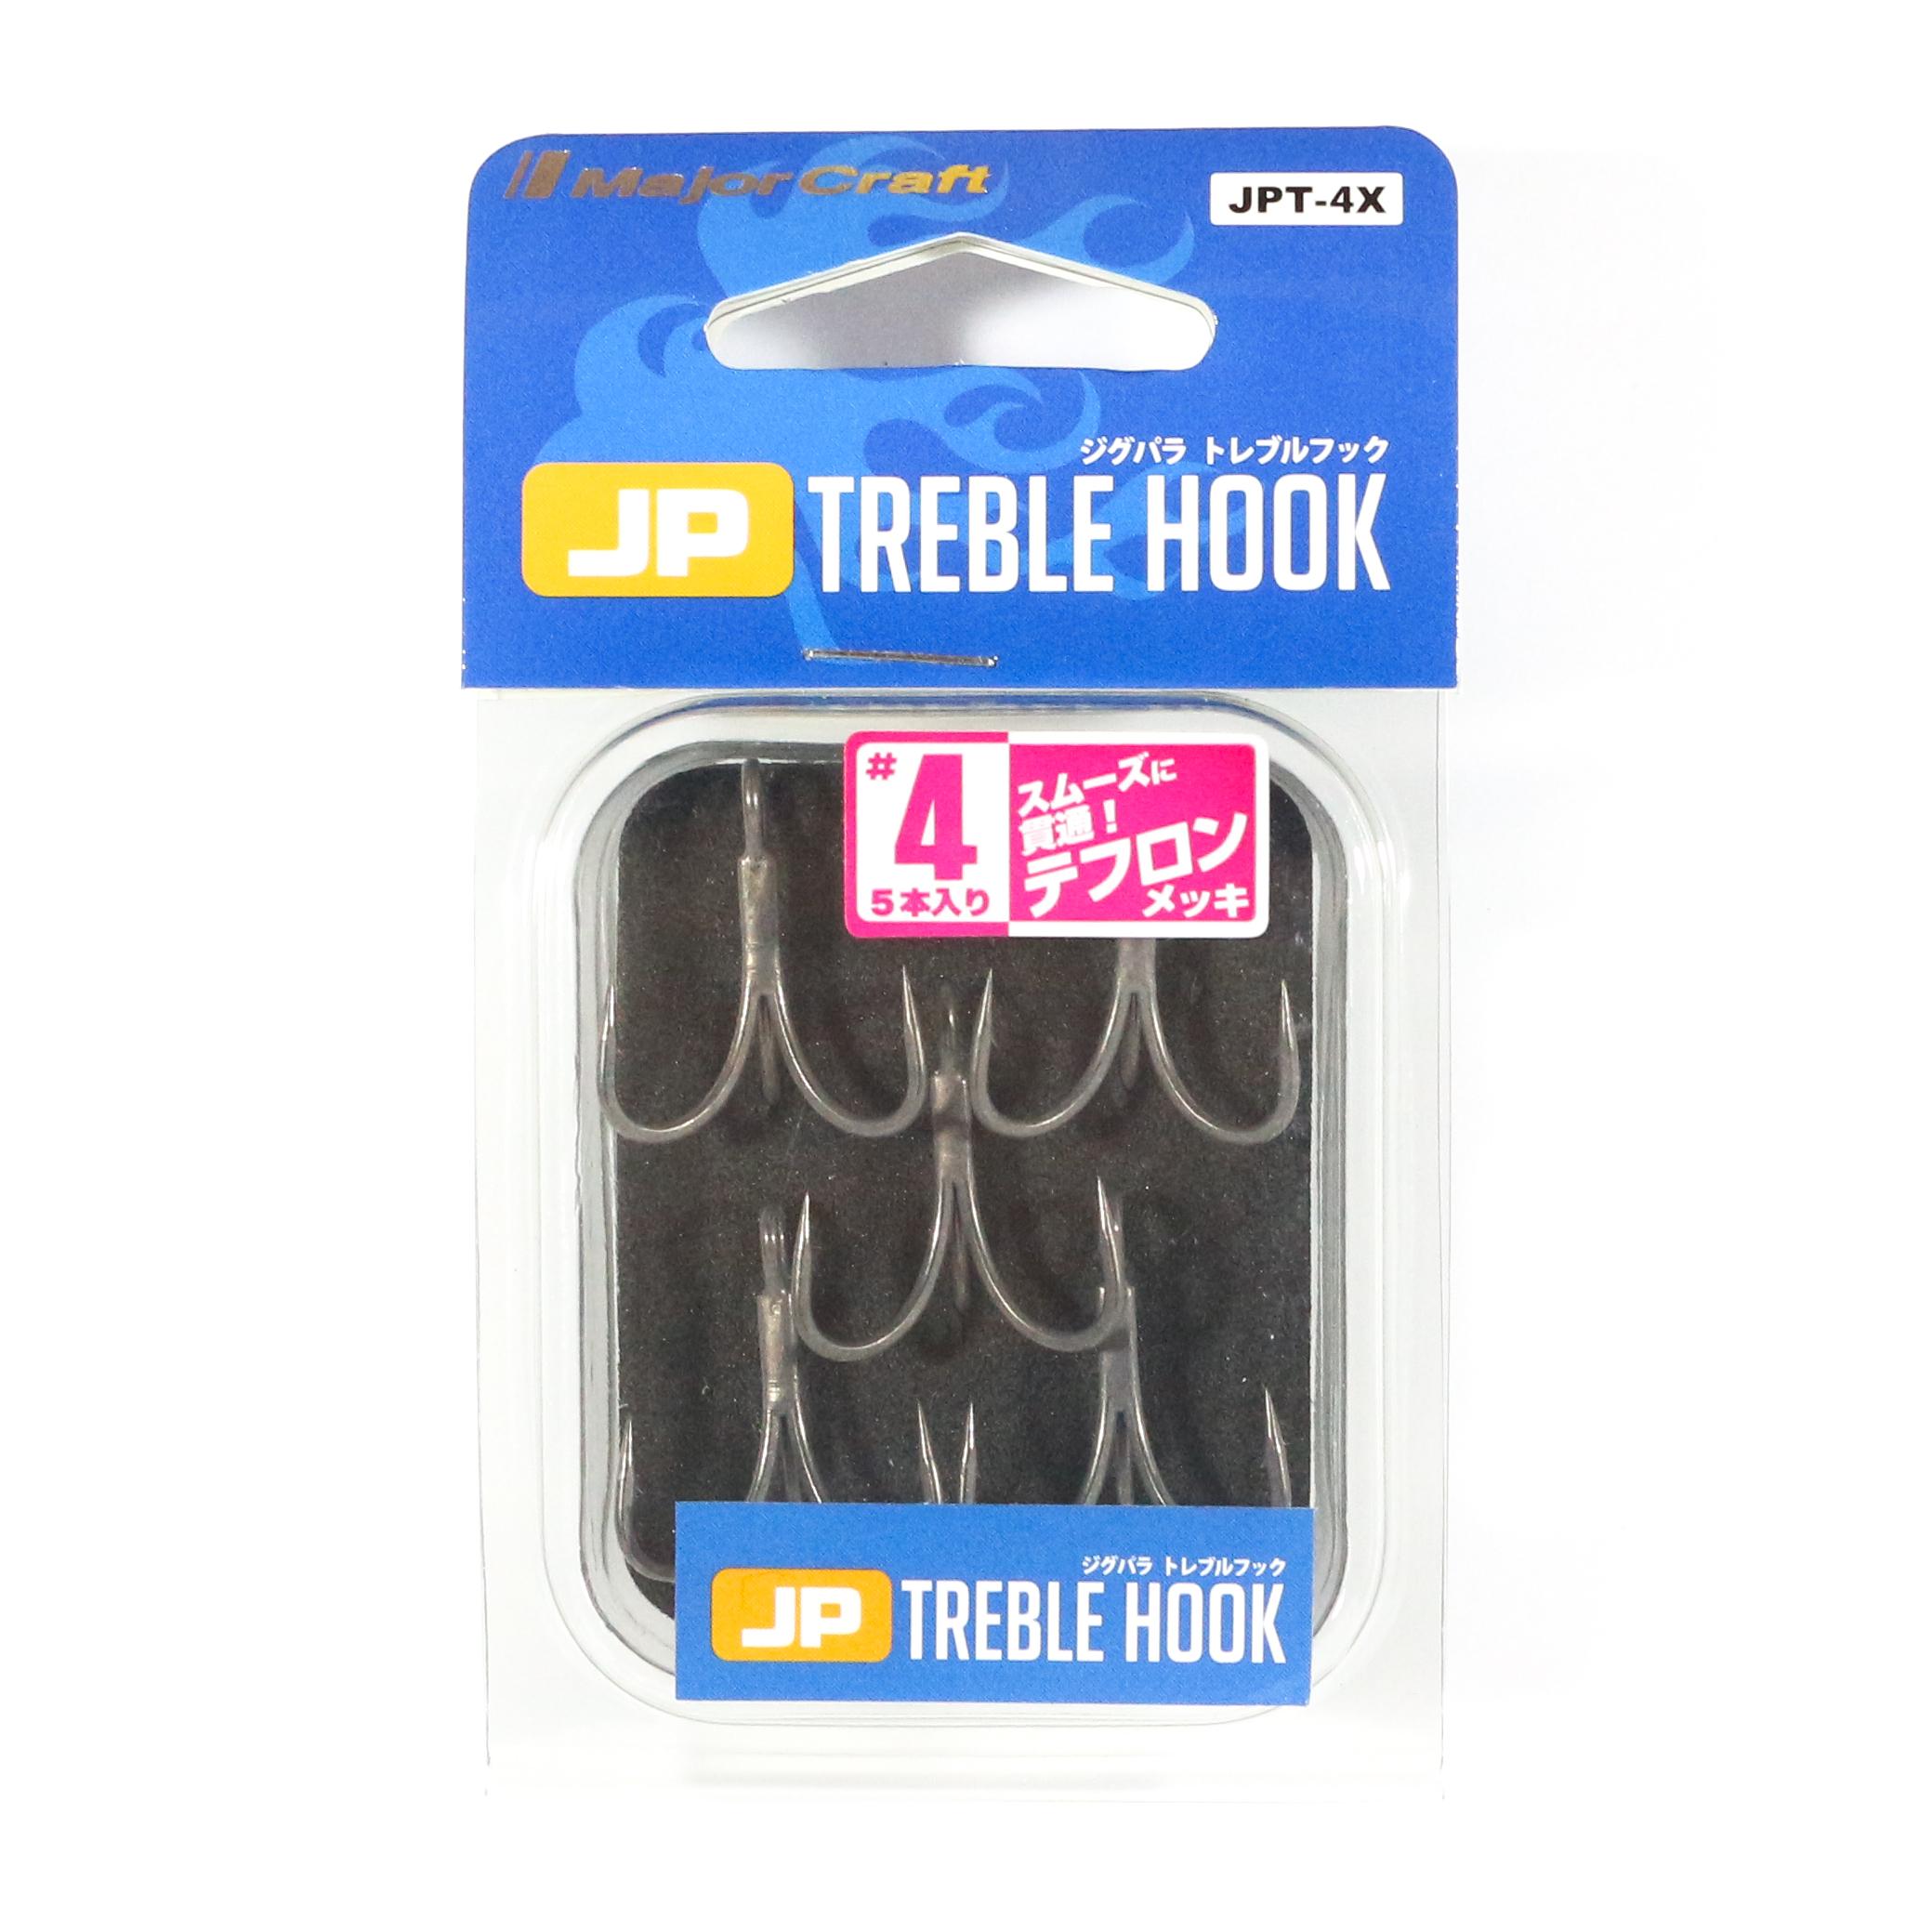 Major Craft Treble Hooks JPT-4X Black Size 4 5 piece per pack (3100)